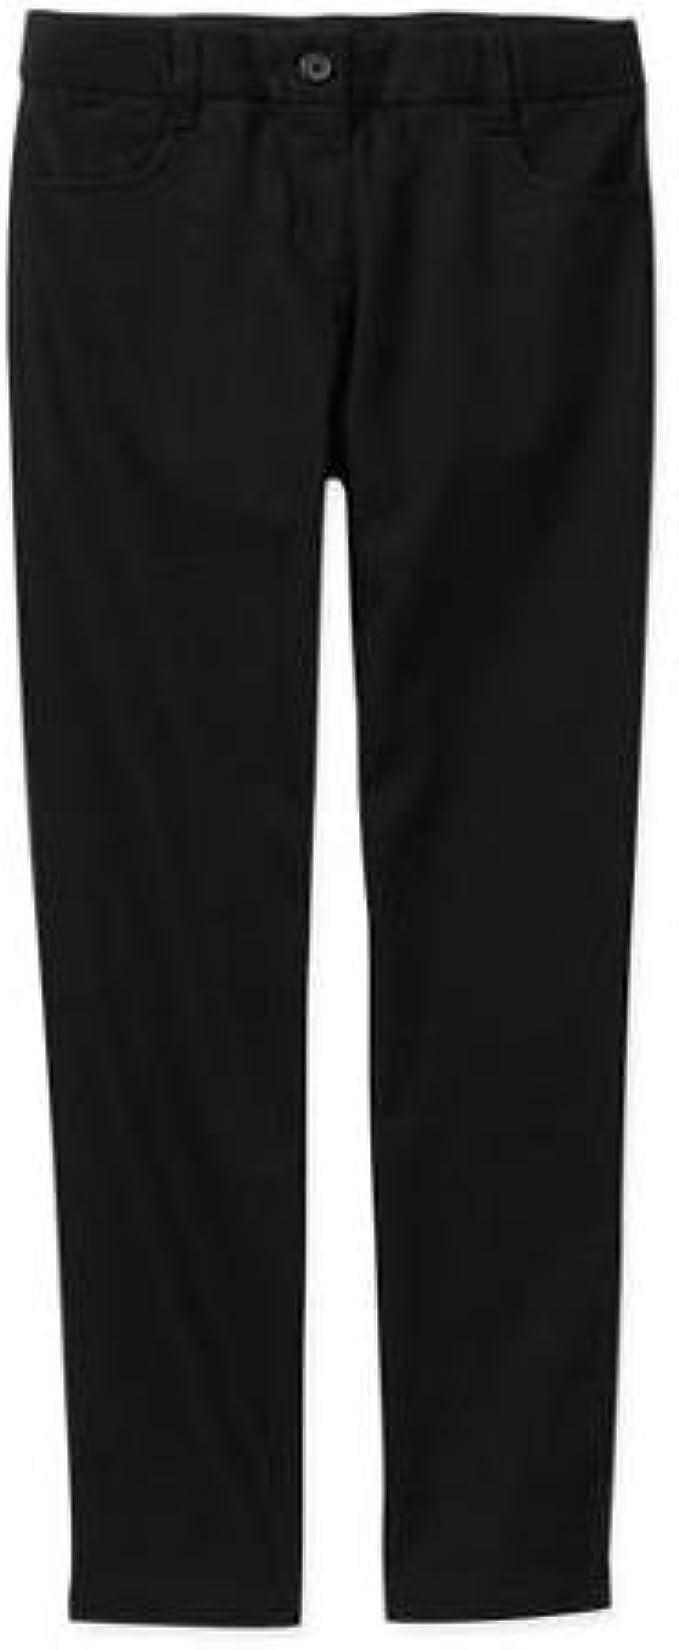 Essentials Girls Slim School Uniform Trousers